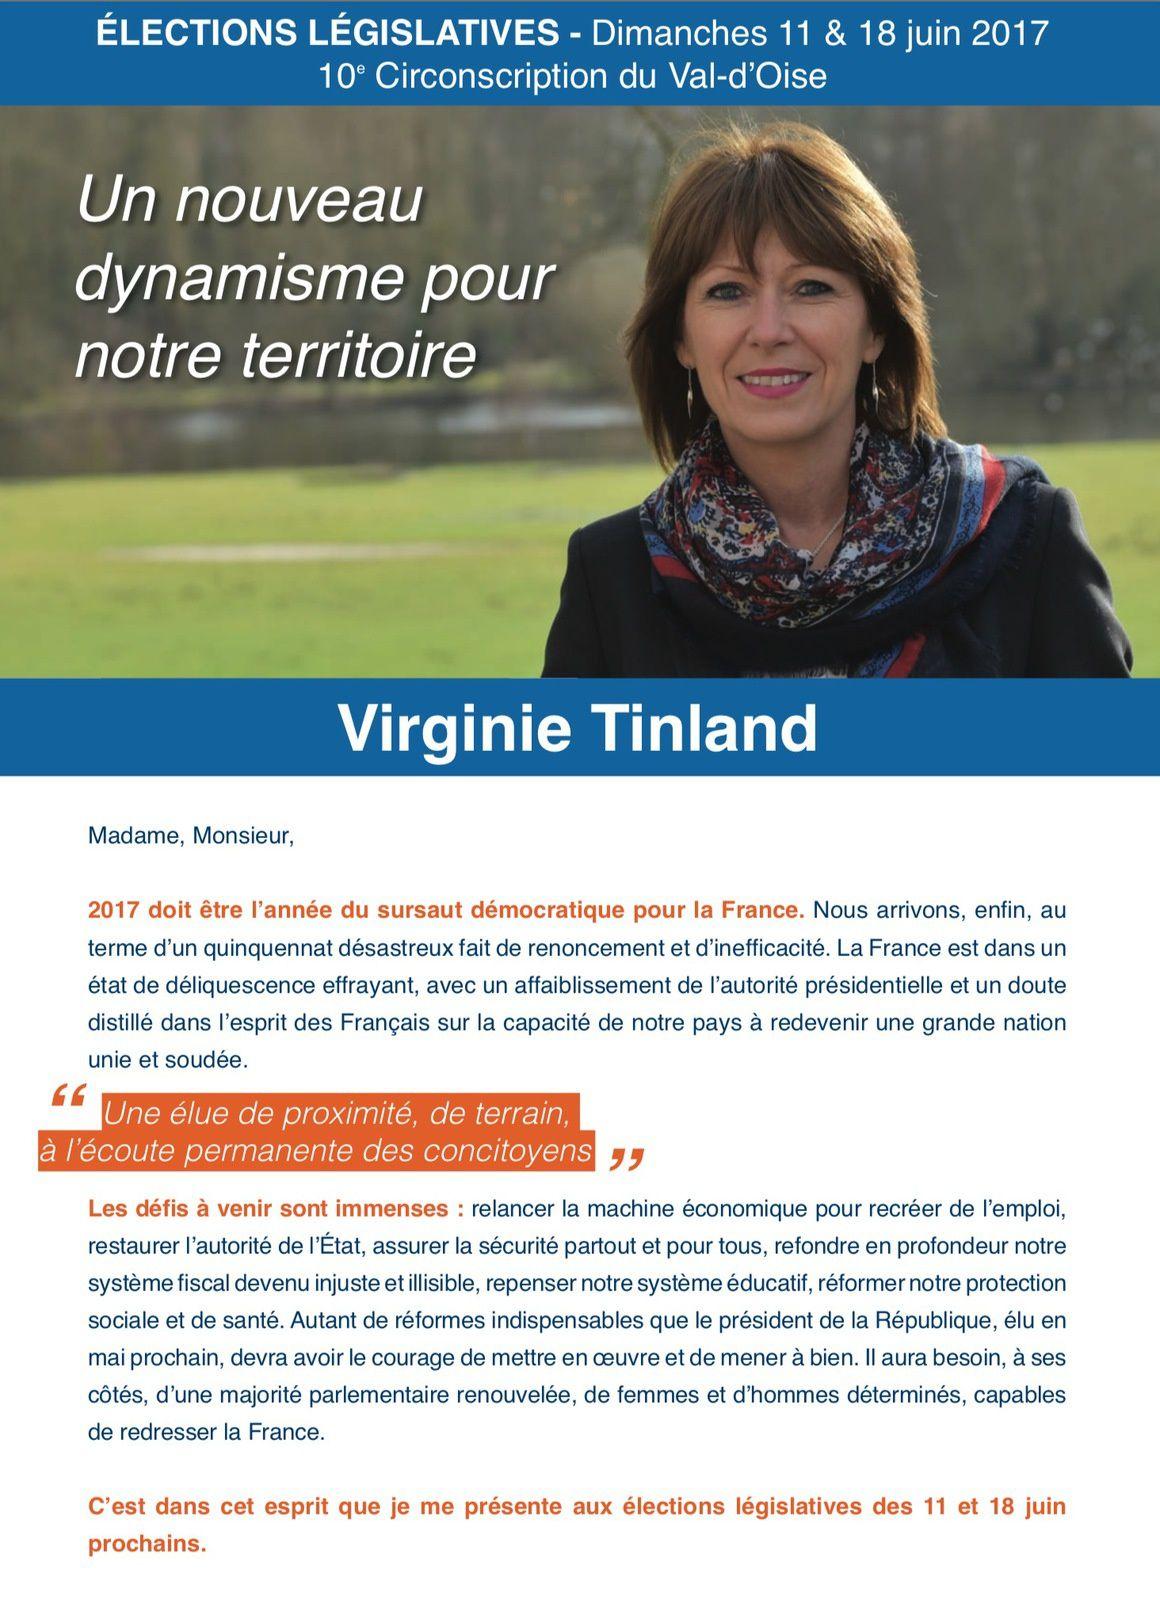 Tract de lancement de campagne de Virginie Tinland